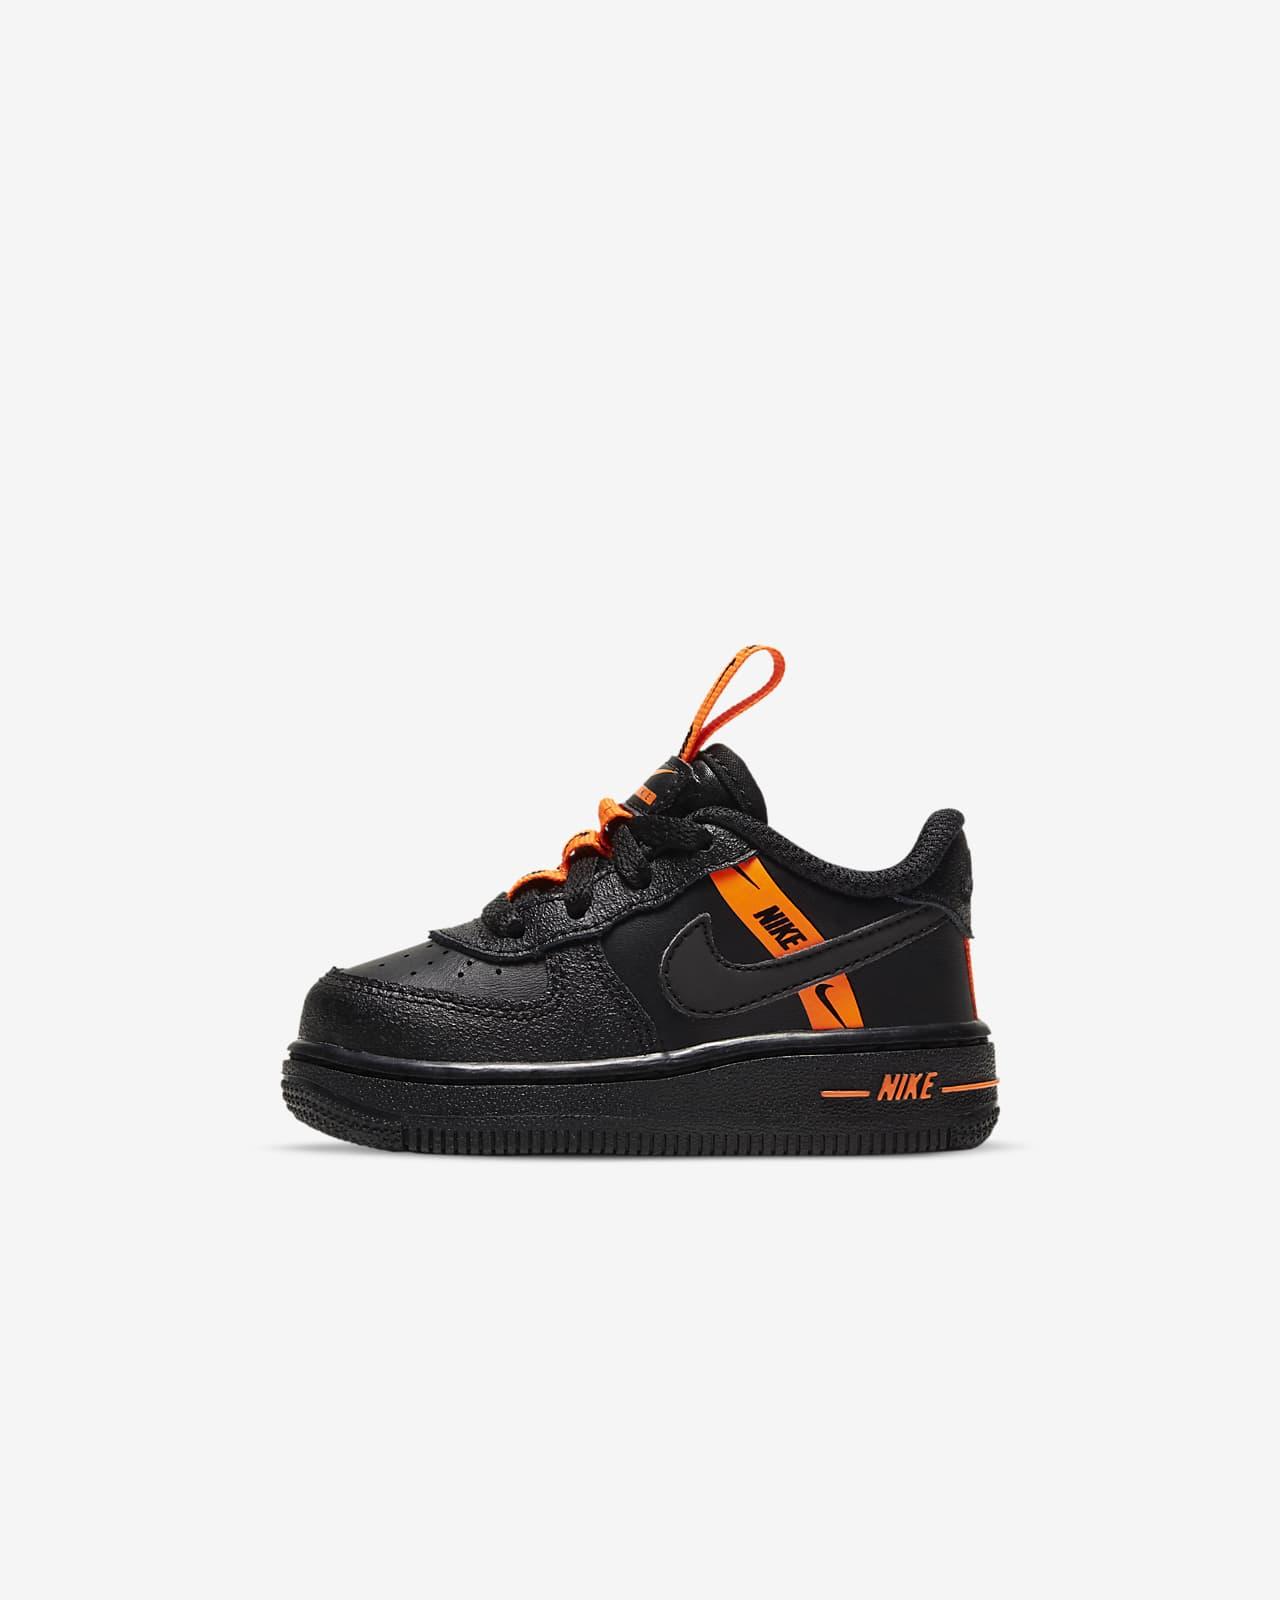 Nike Force 1 LV8 KSA (TD) 婴童运动童鞋